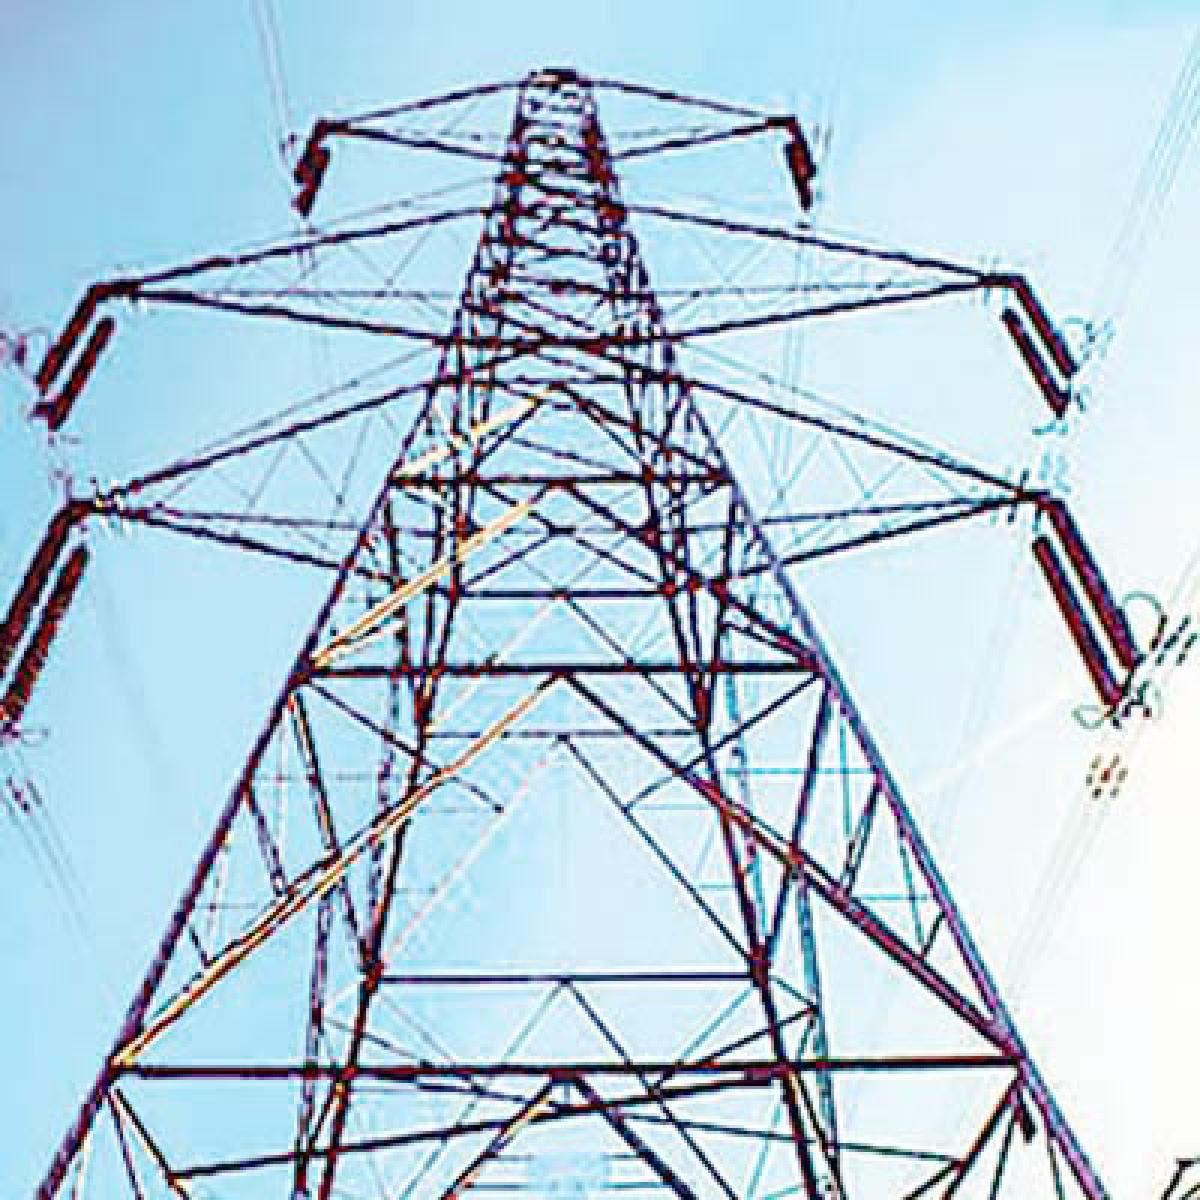 Power sector revival a priority: Arun Jaitley